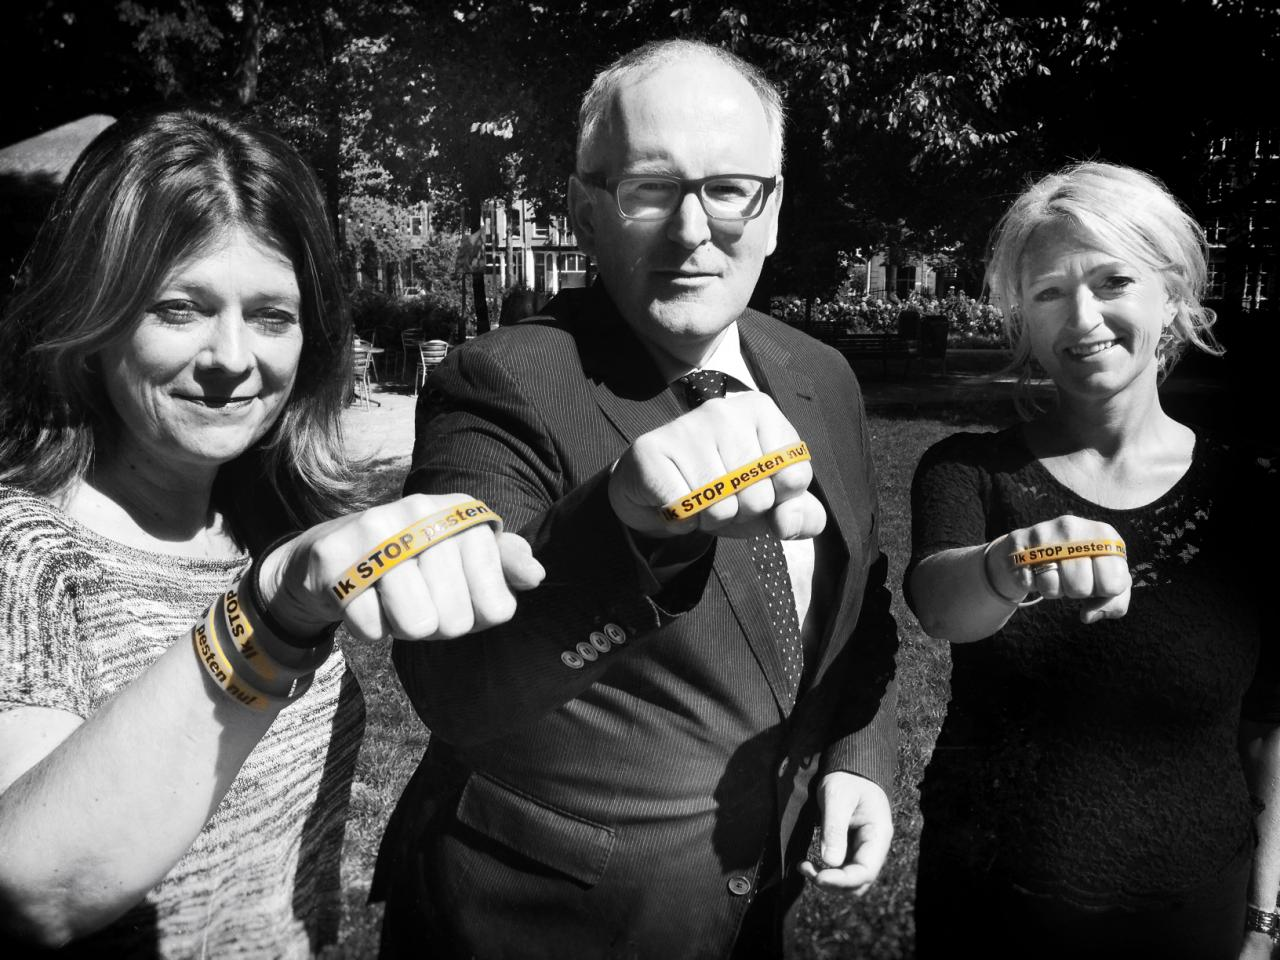 Minister Timmermans met oranje bandje tegen pesten: Ik STOP pesten nu! www.stoppestennu.nl